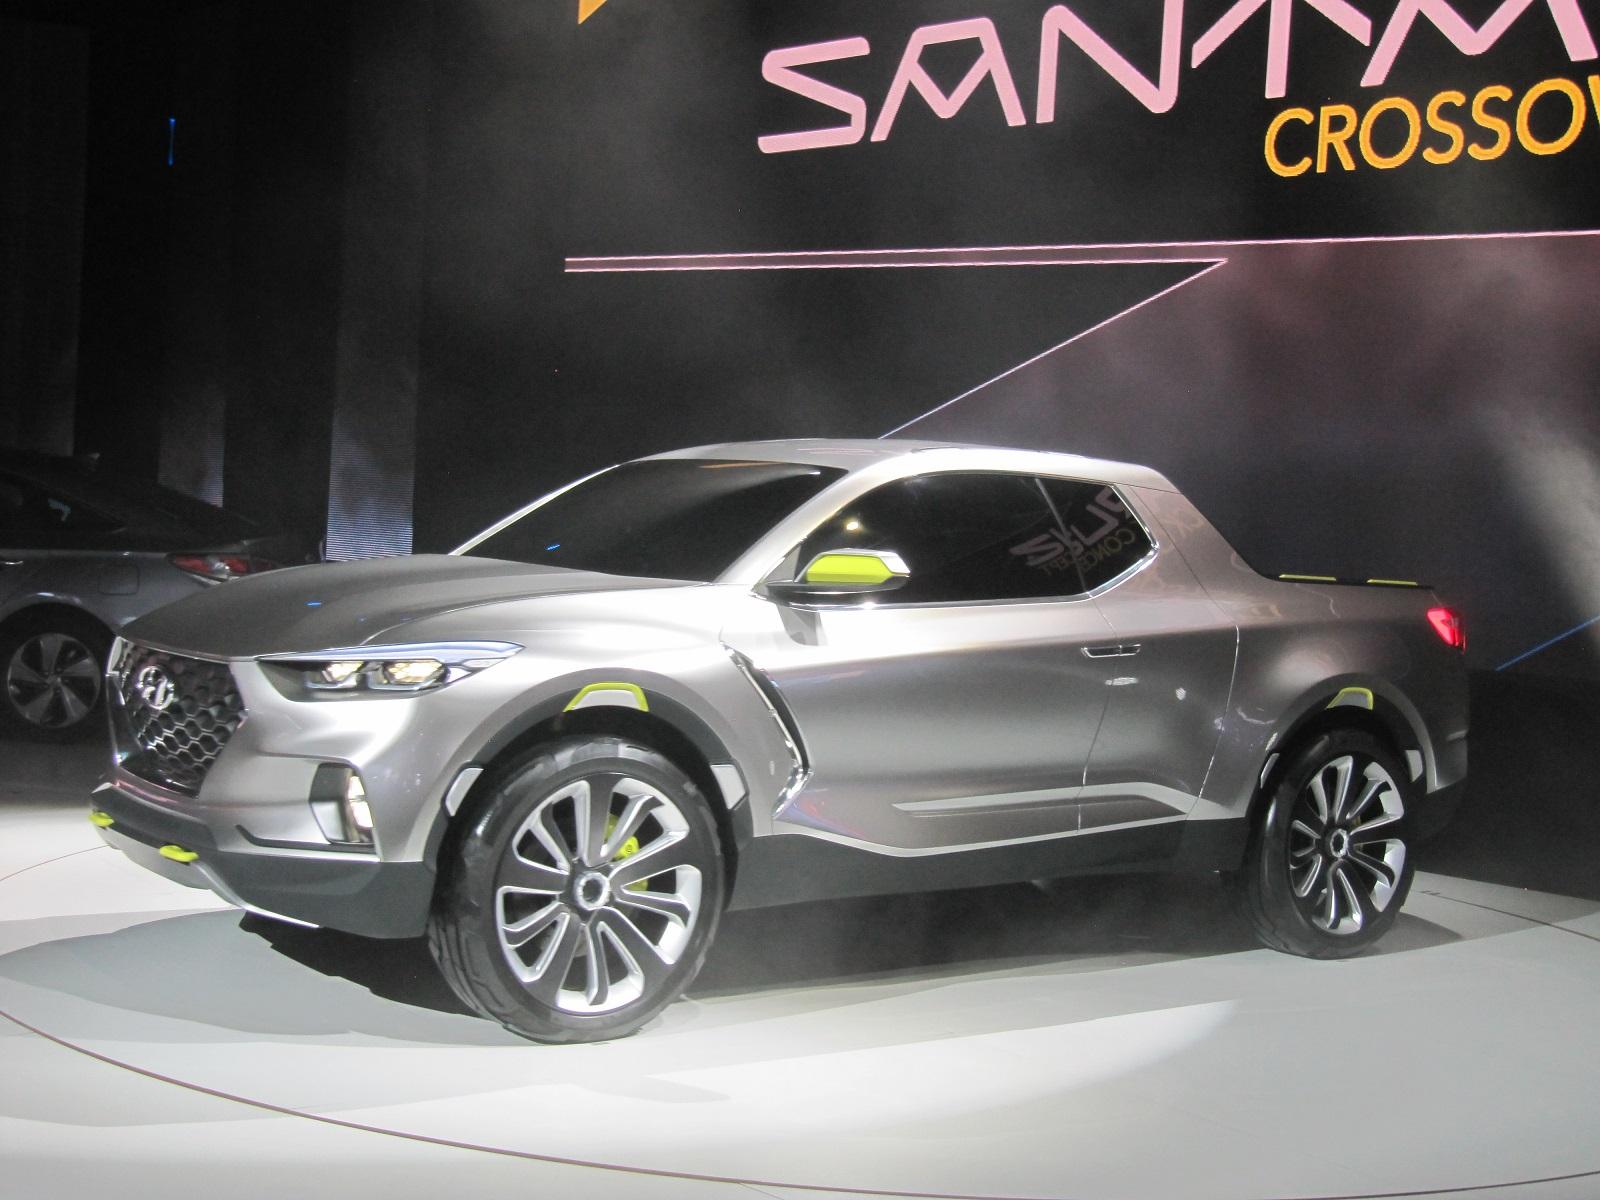 hyundai santa cruz crossover pickup truck concept 2015 detroit auto show. Black Bedroom Furniture Sets. Home Design Ideas